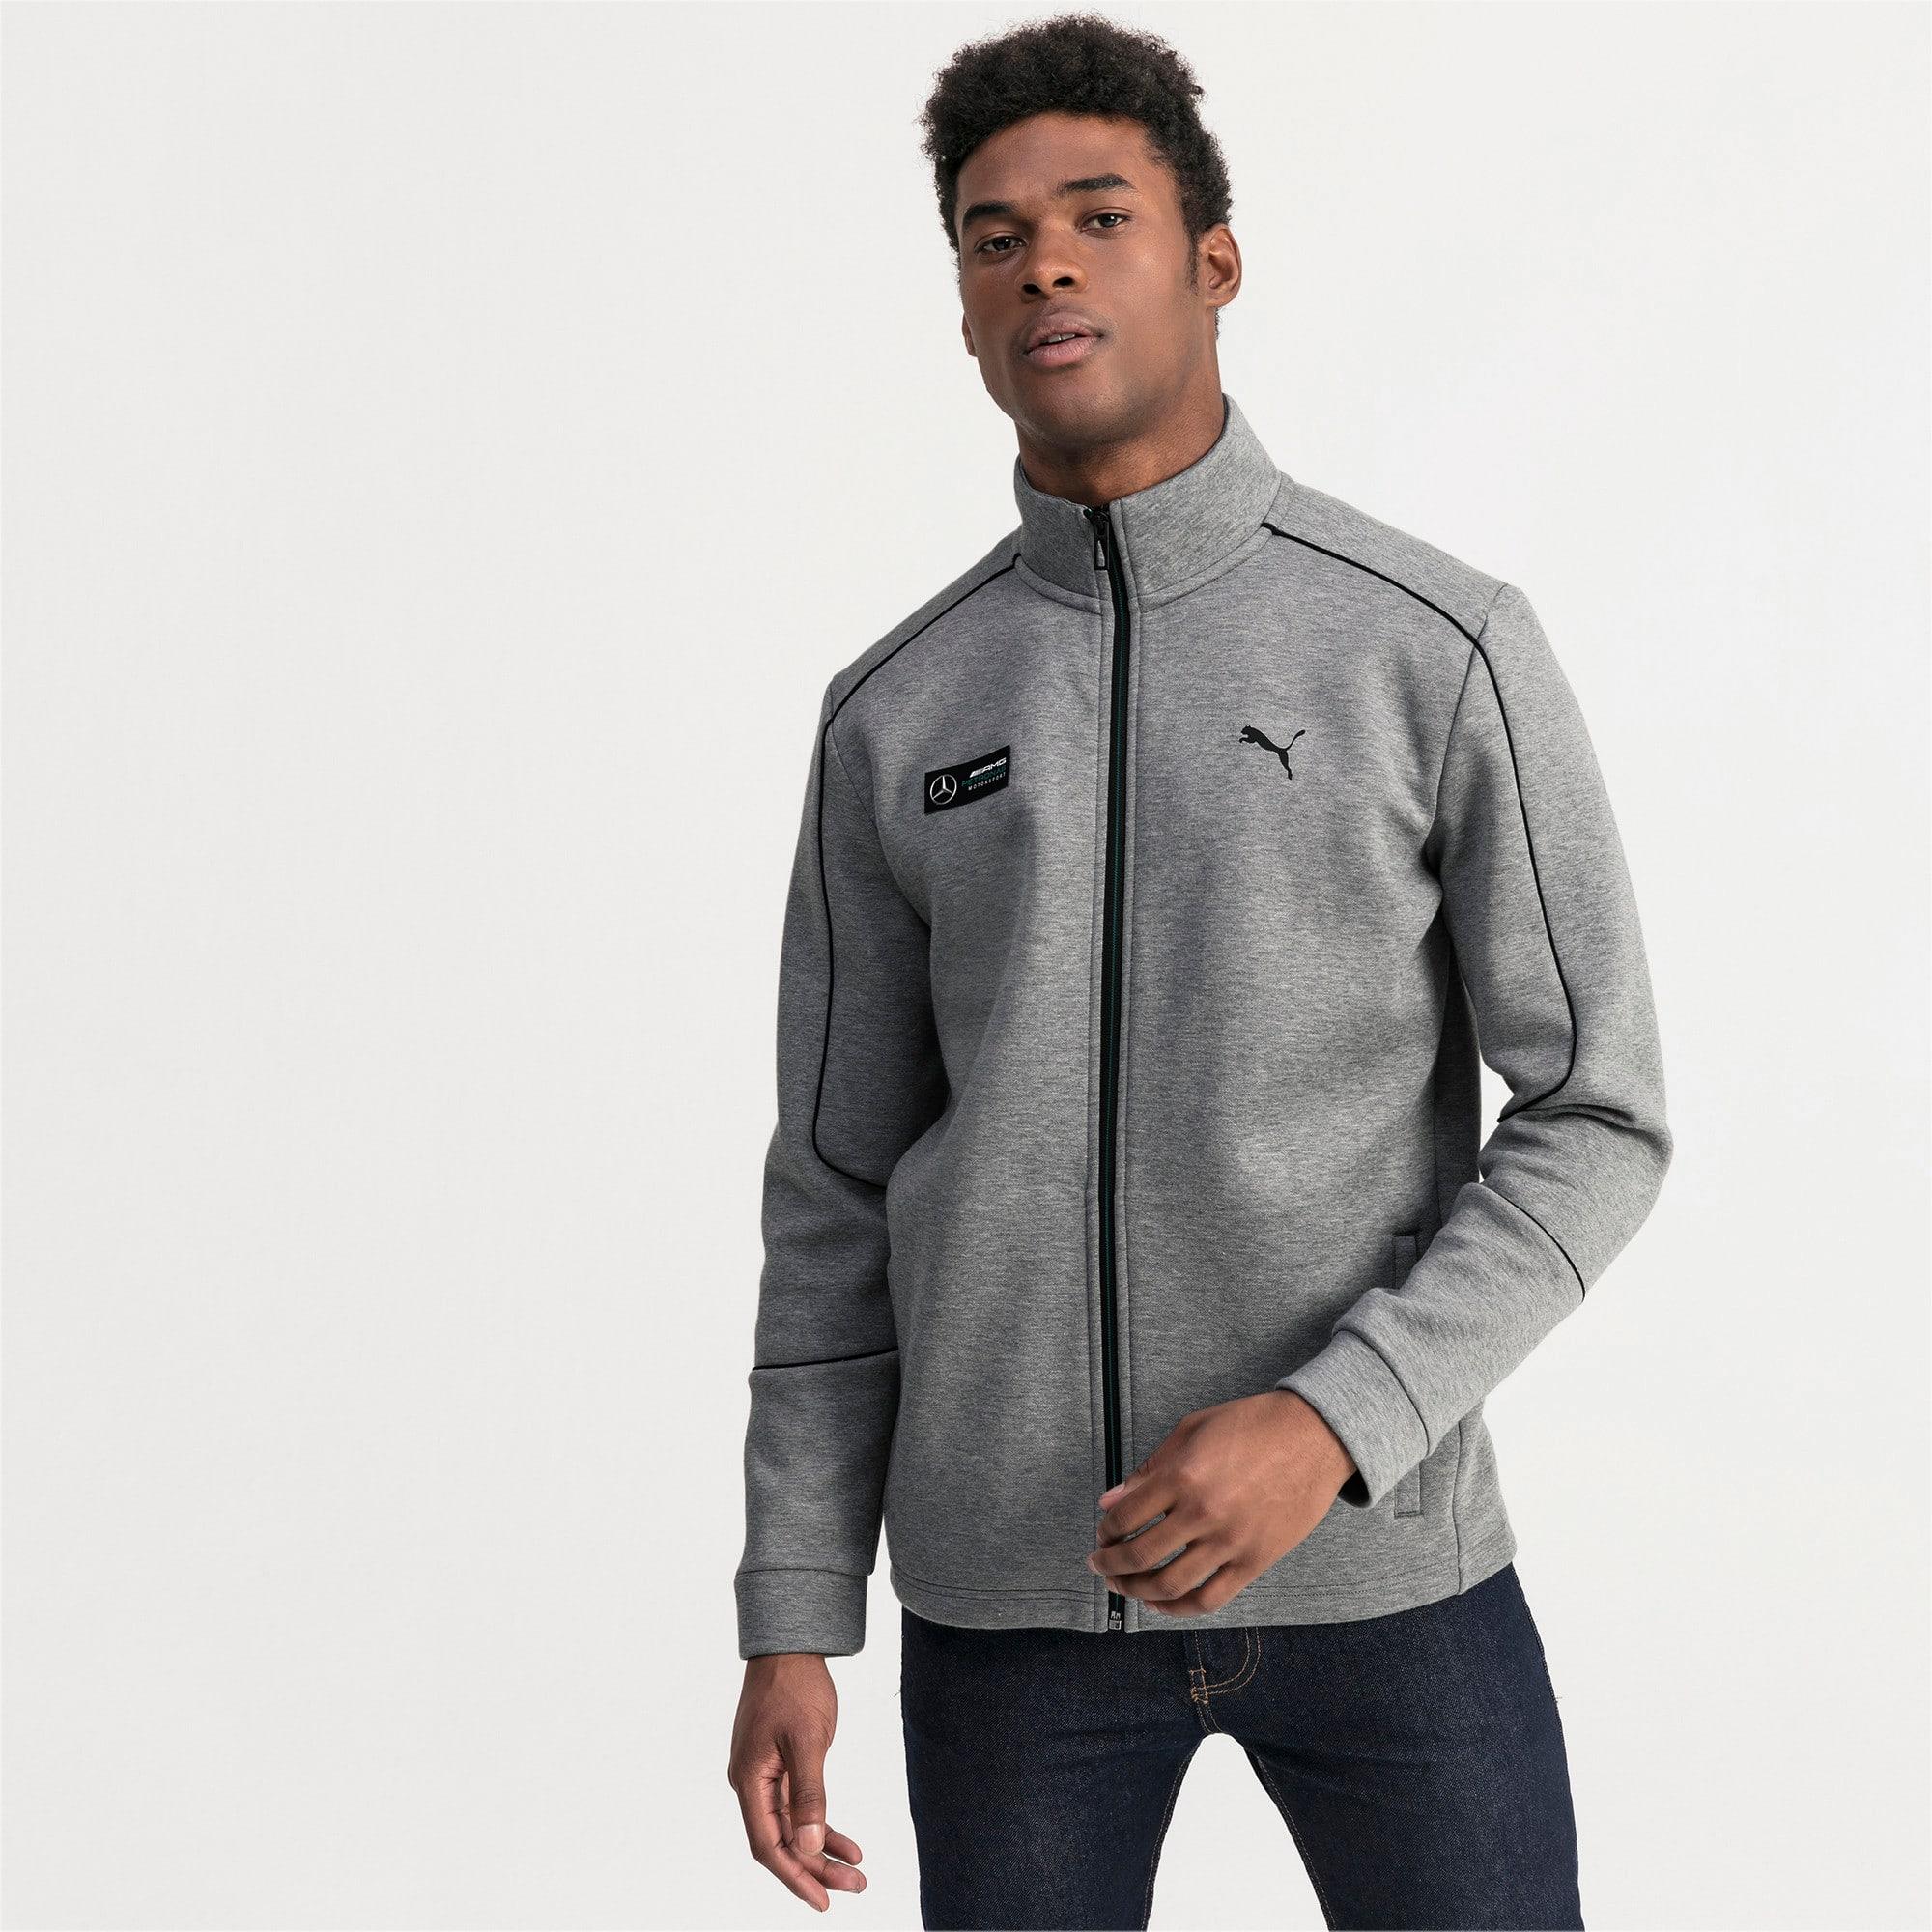 Thumbnail 1 of Mercedes AMG Petronas Men's Sweat Jacket, Medium Gray Heather, medium